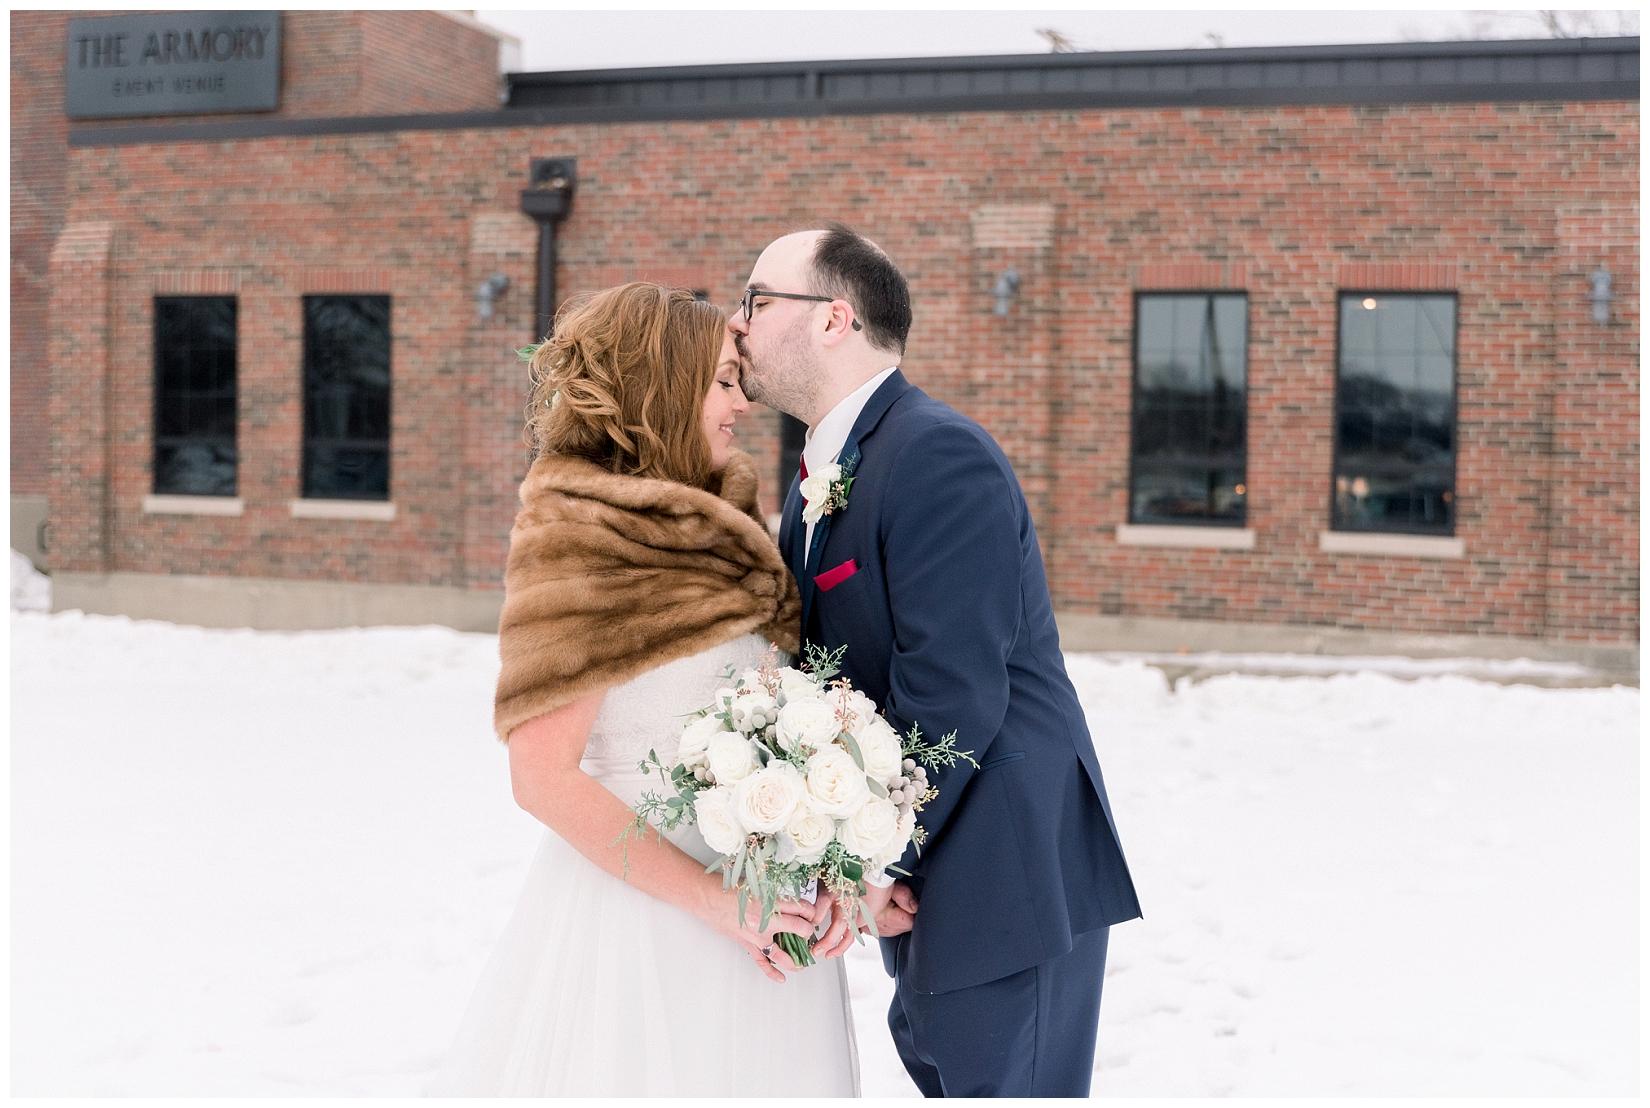 cat-alkire-wedding-photographer-indiana-chicago-indianapolis-fort-wayne_0973.jpg